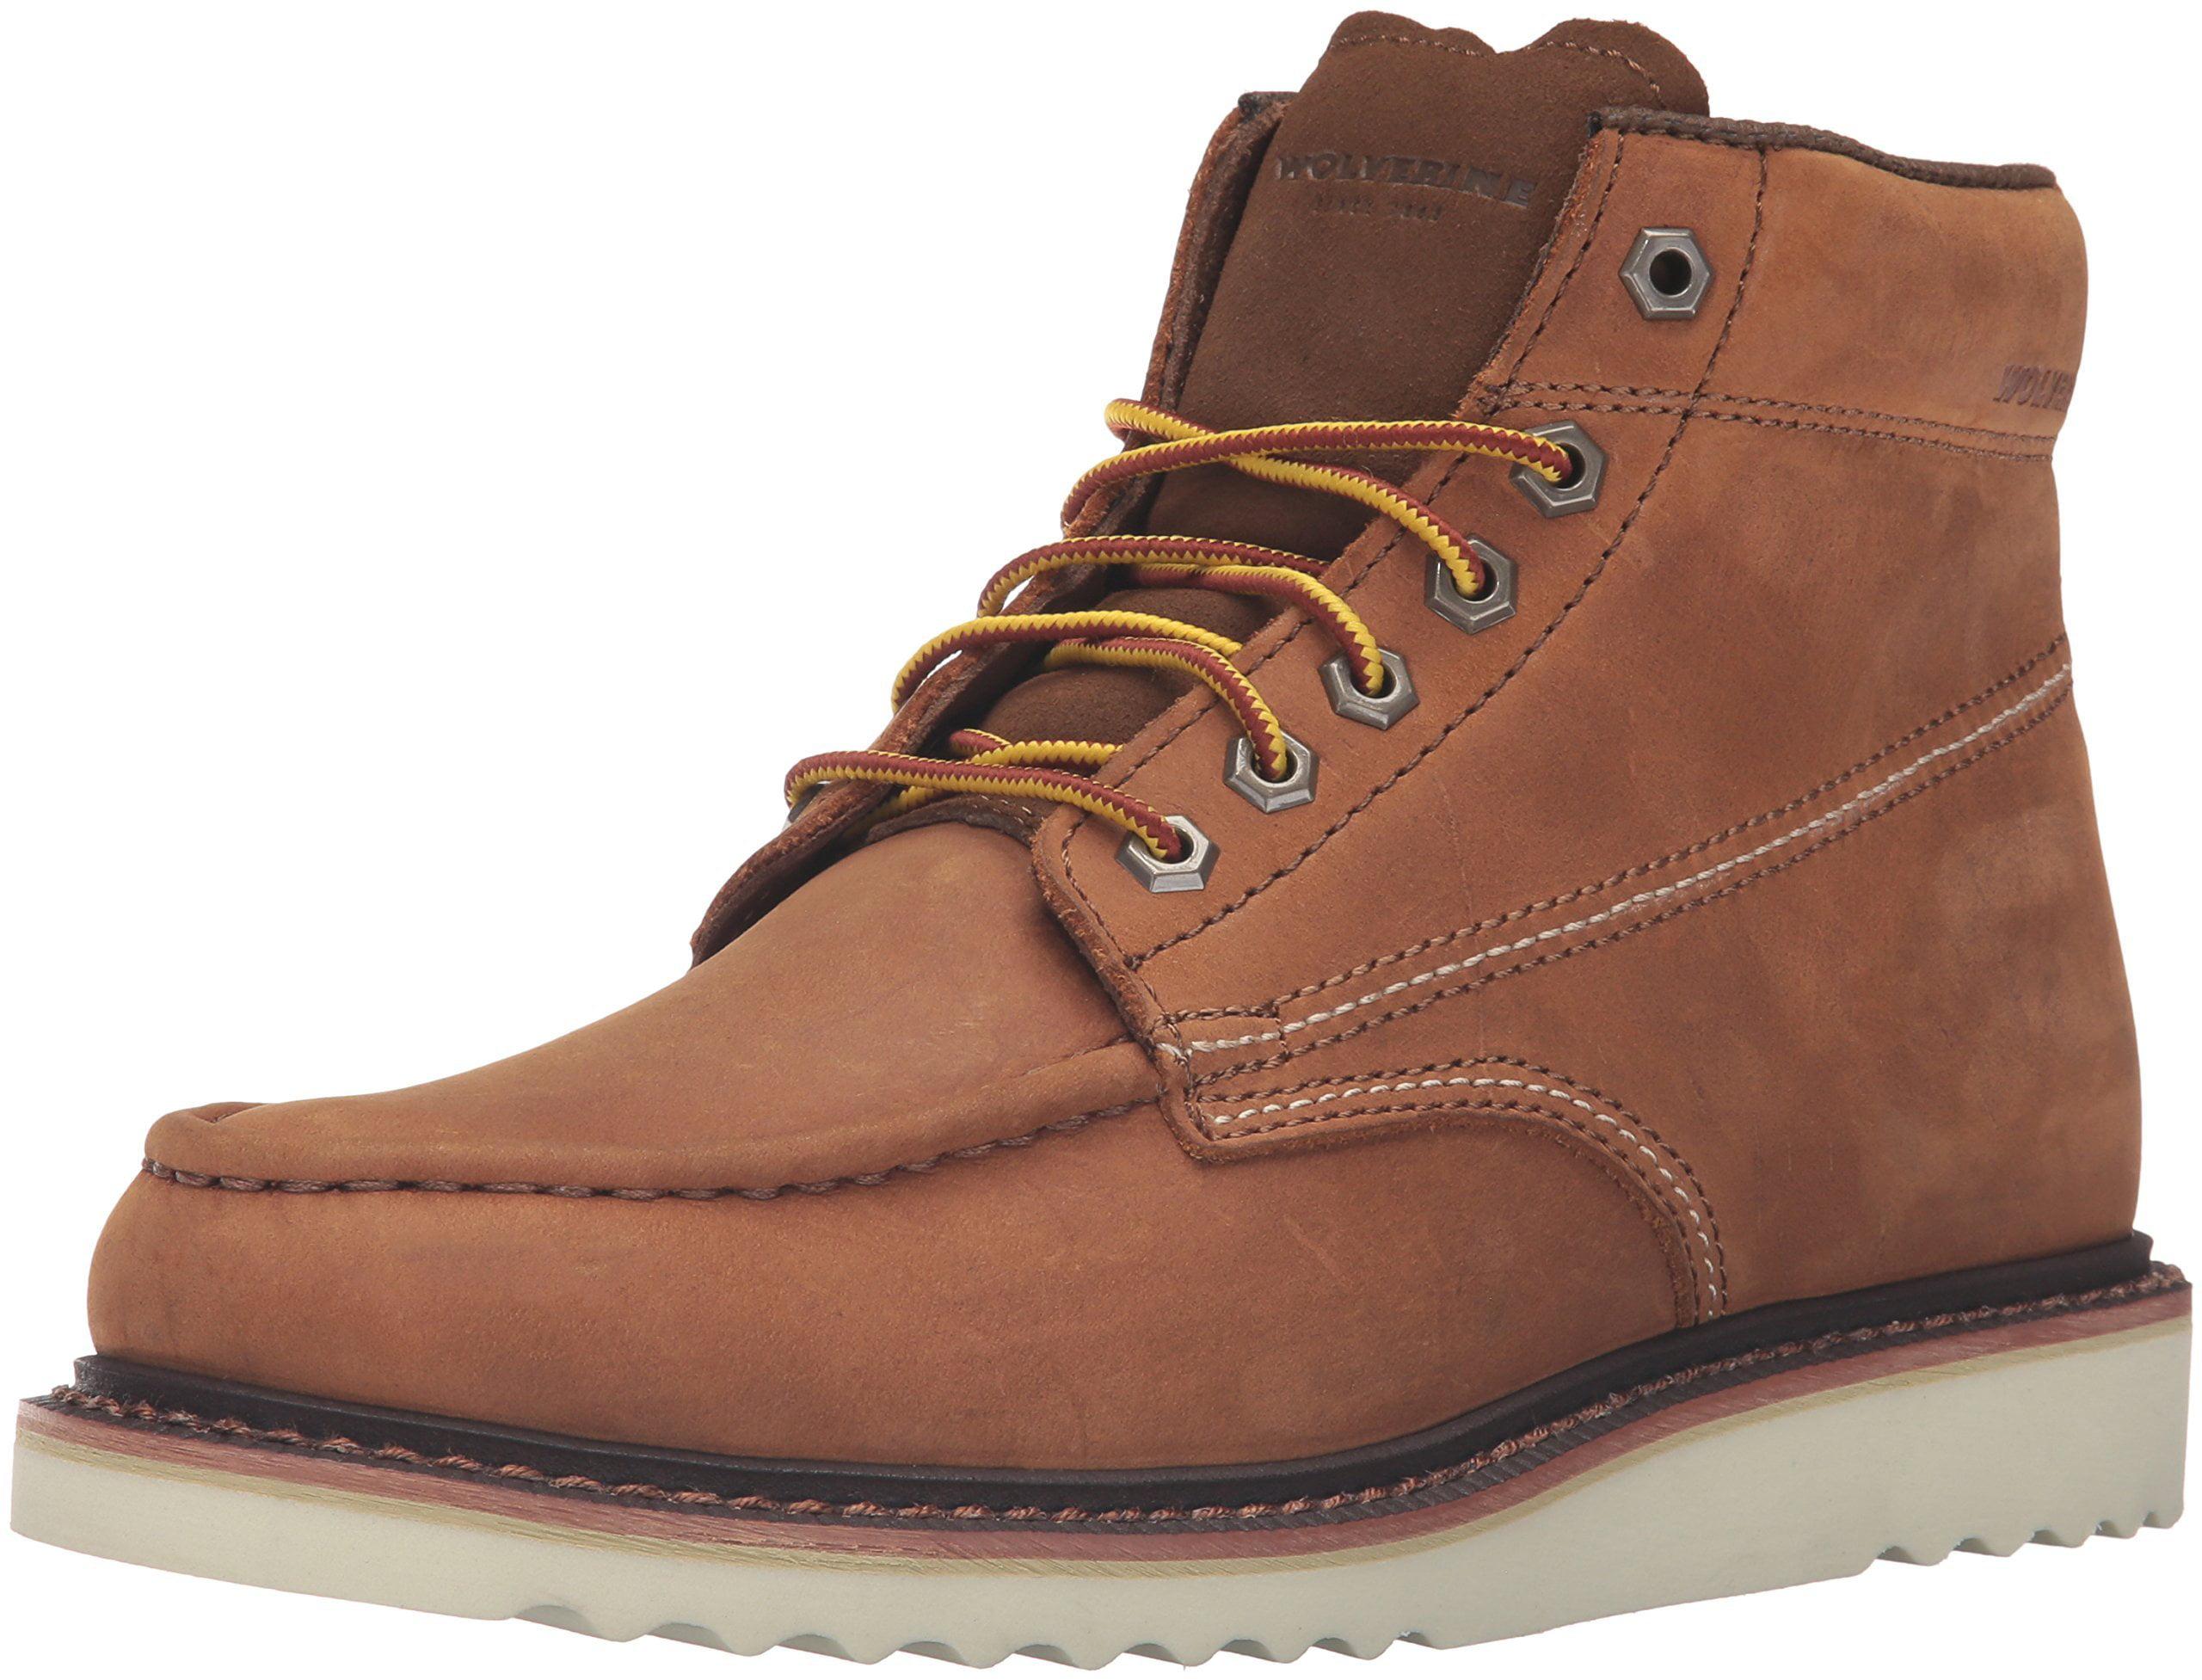 4e567710b9f 1883 by Wolverine Men's Ranger Winter Boot (10 D(M) US, Boots, Tan)